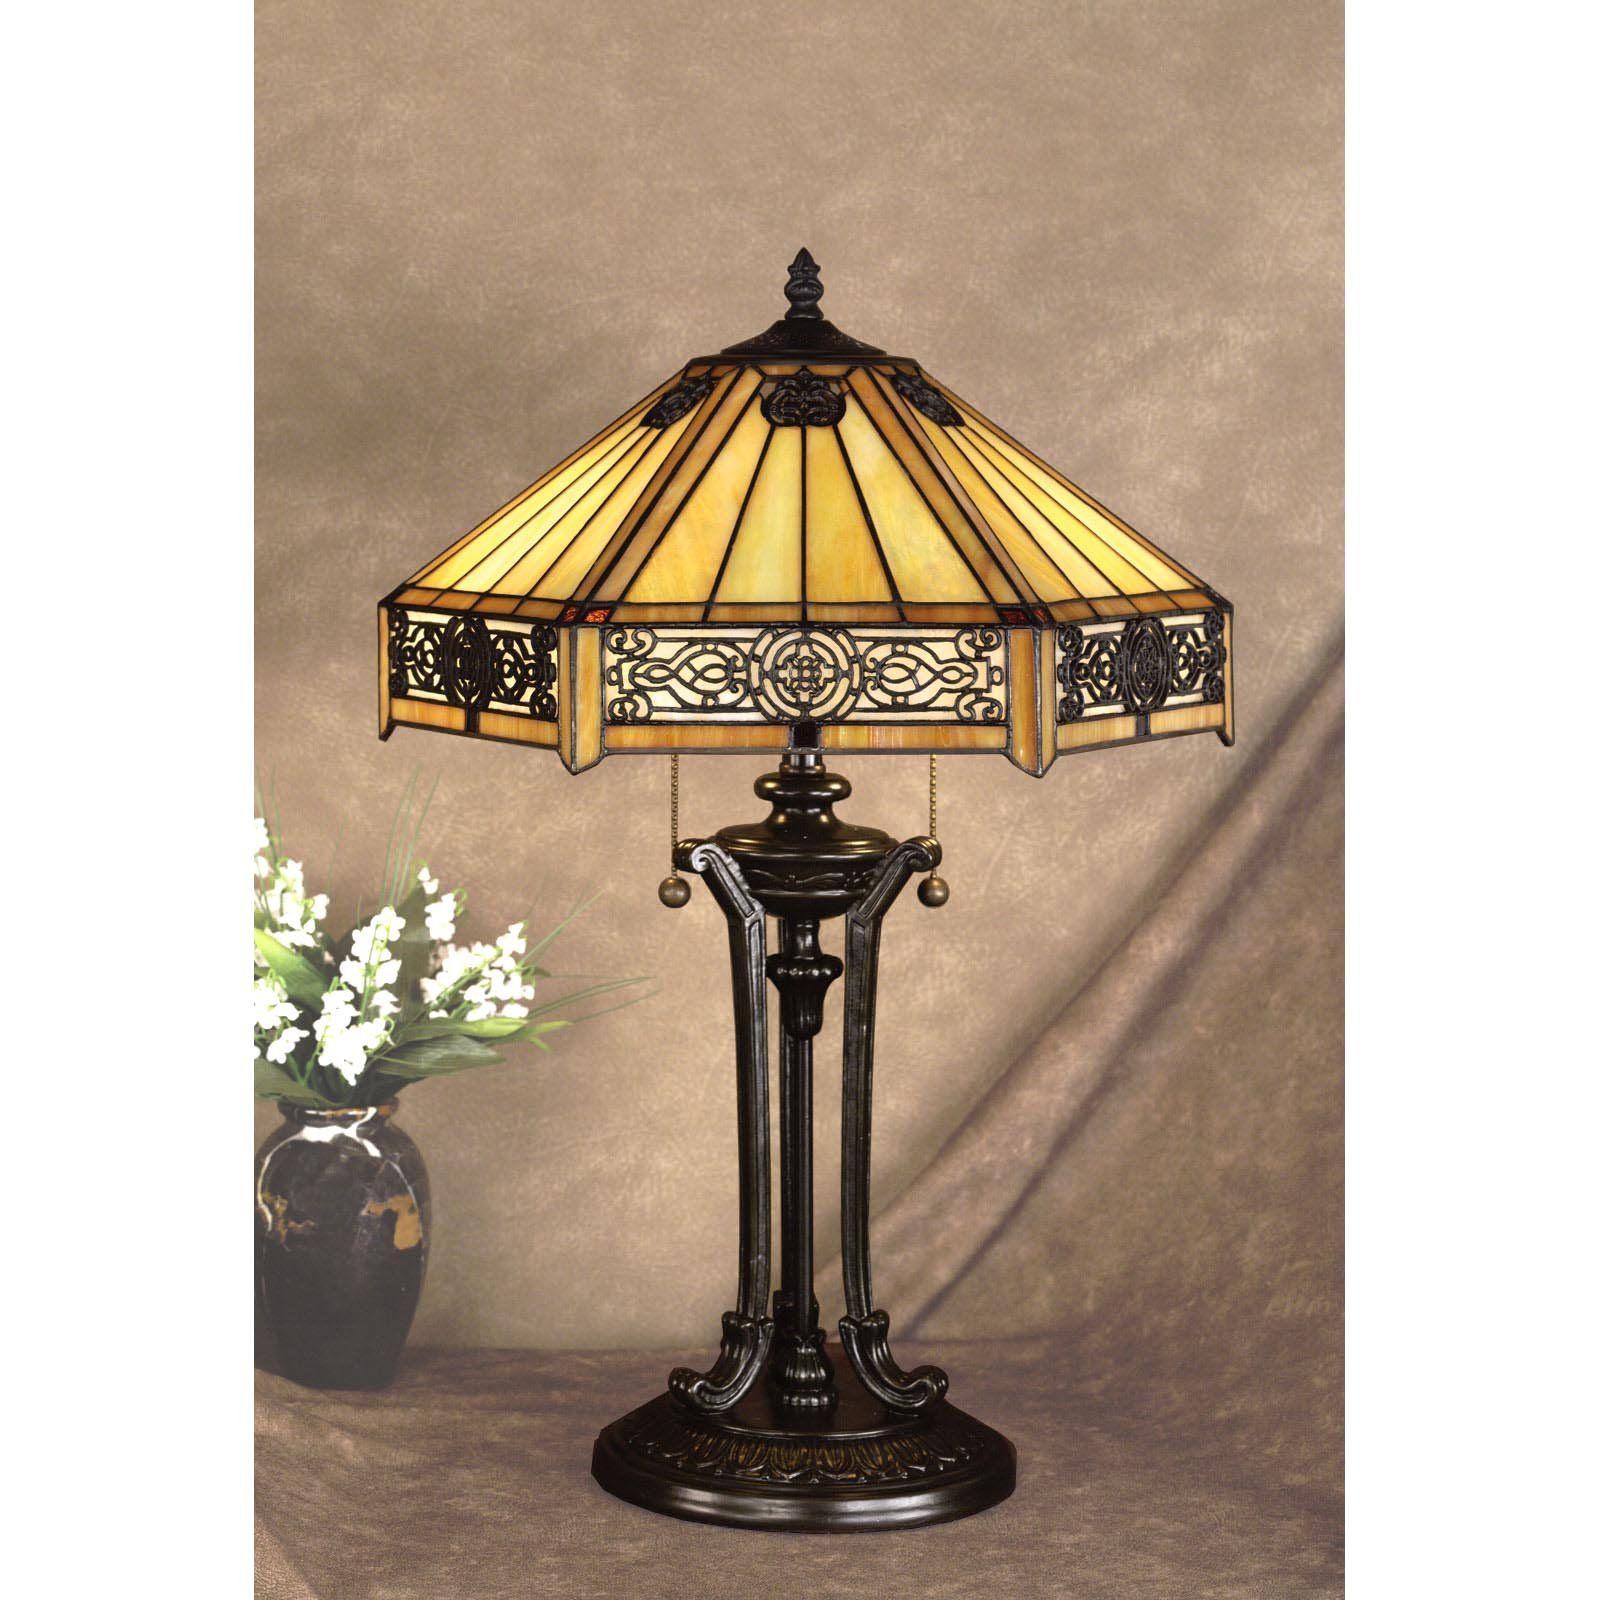 Tiffany Art Nouveau Lamp, Louis Comfort Tiffany